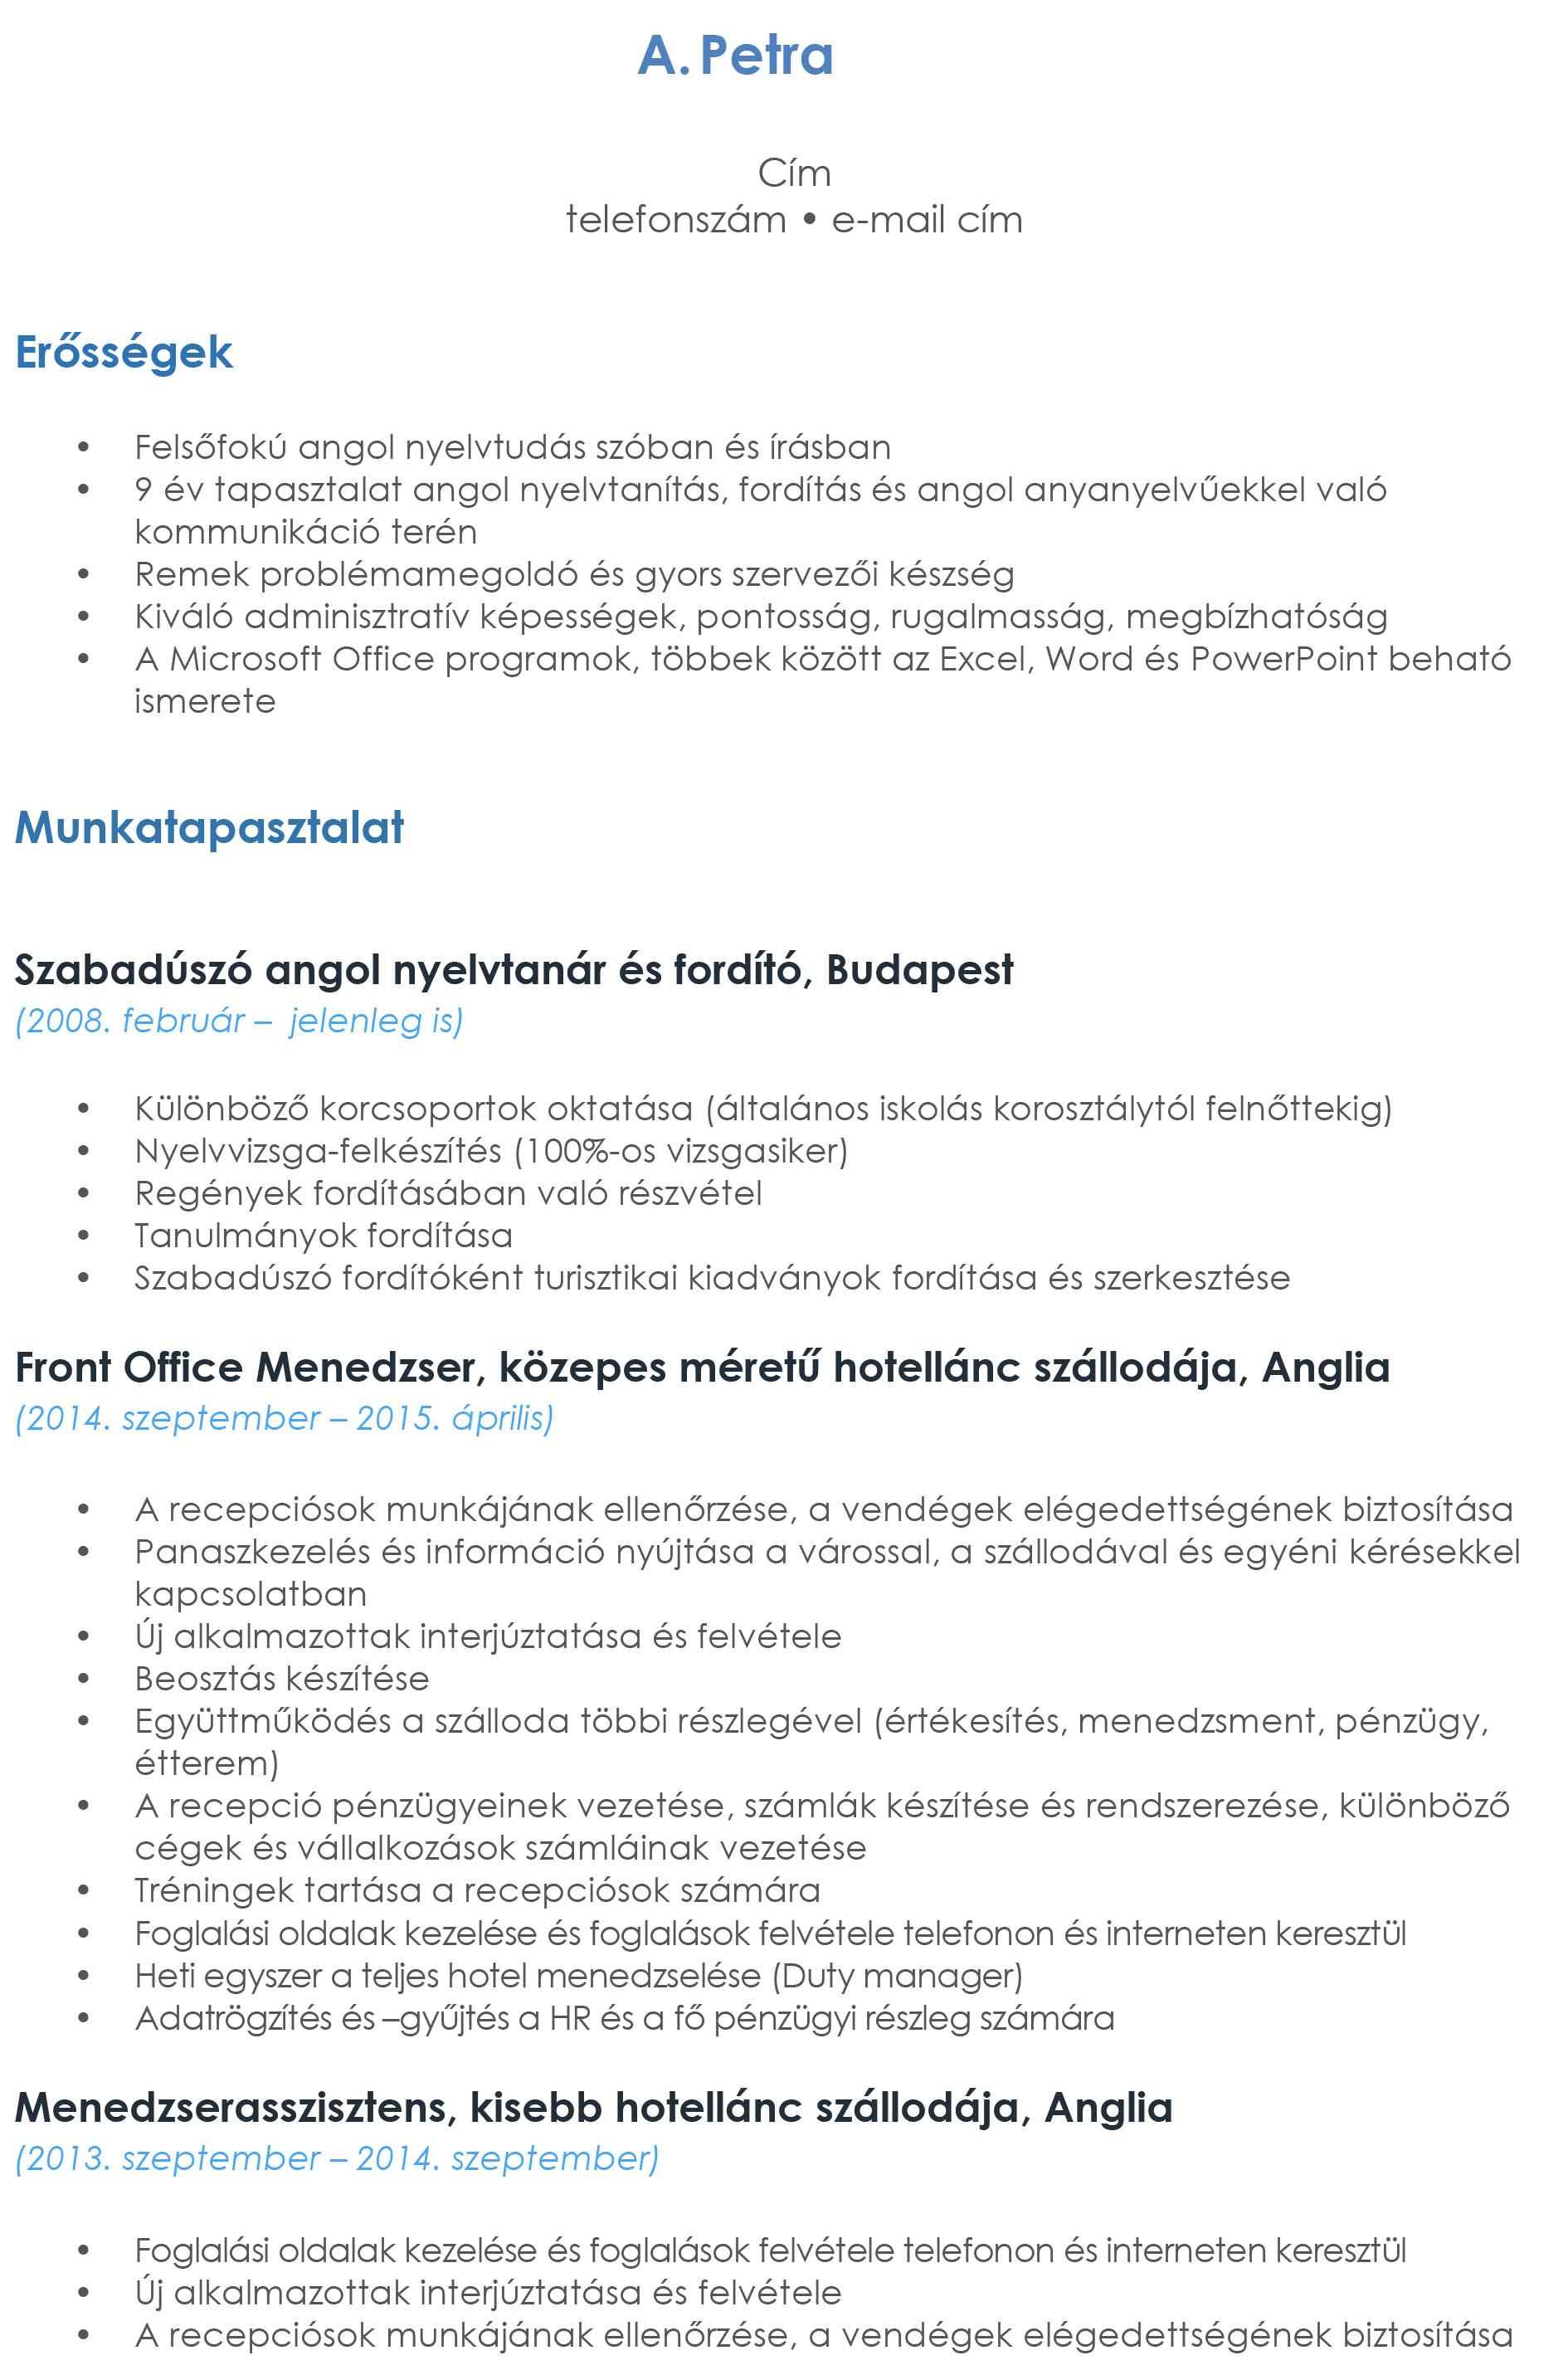 eszter_cv_magyar_admin_pl-1.jpg